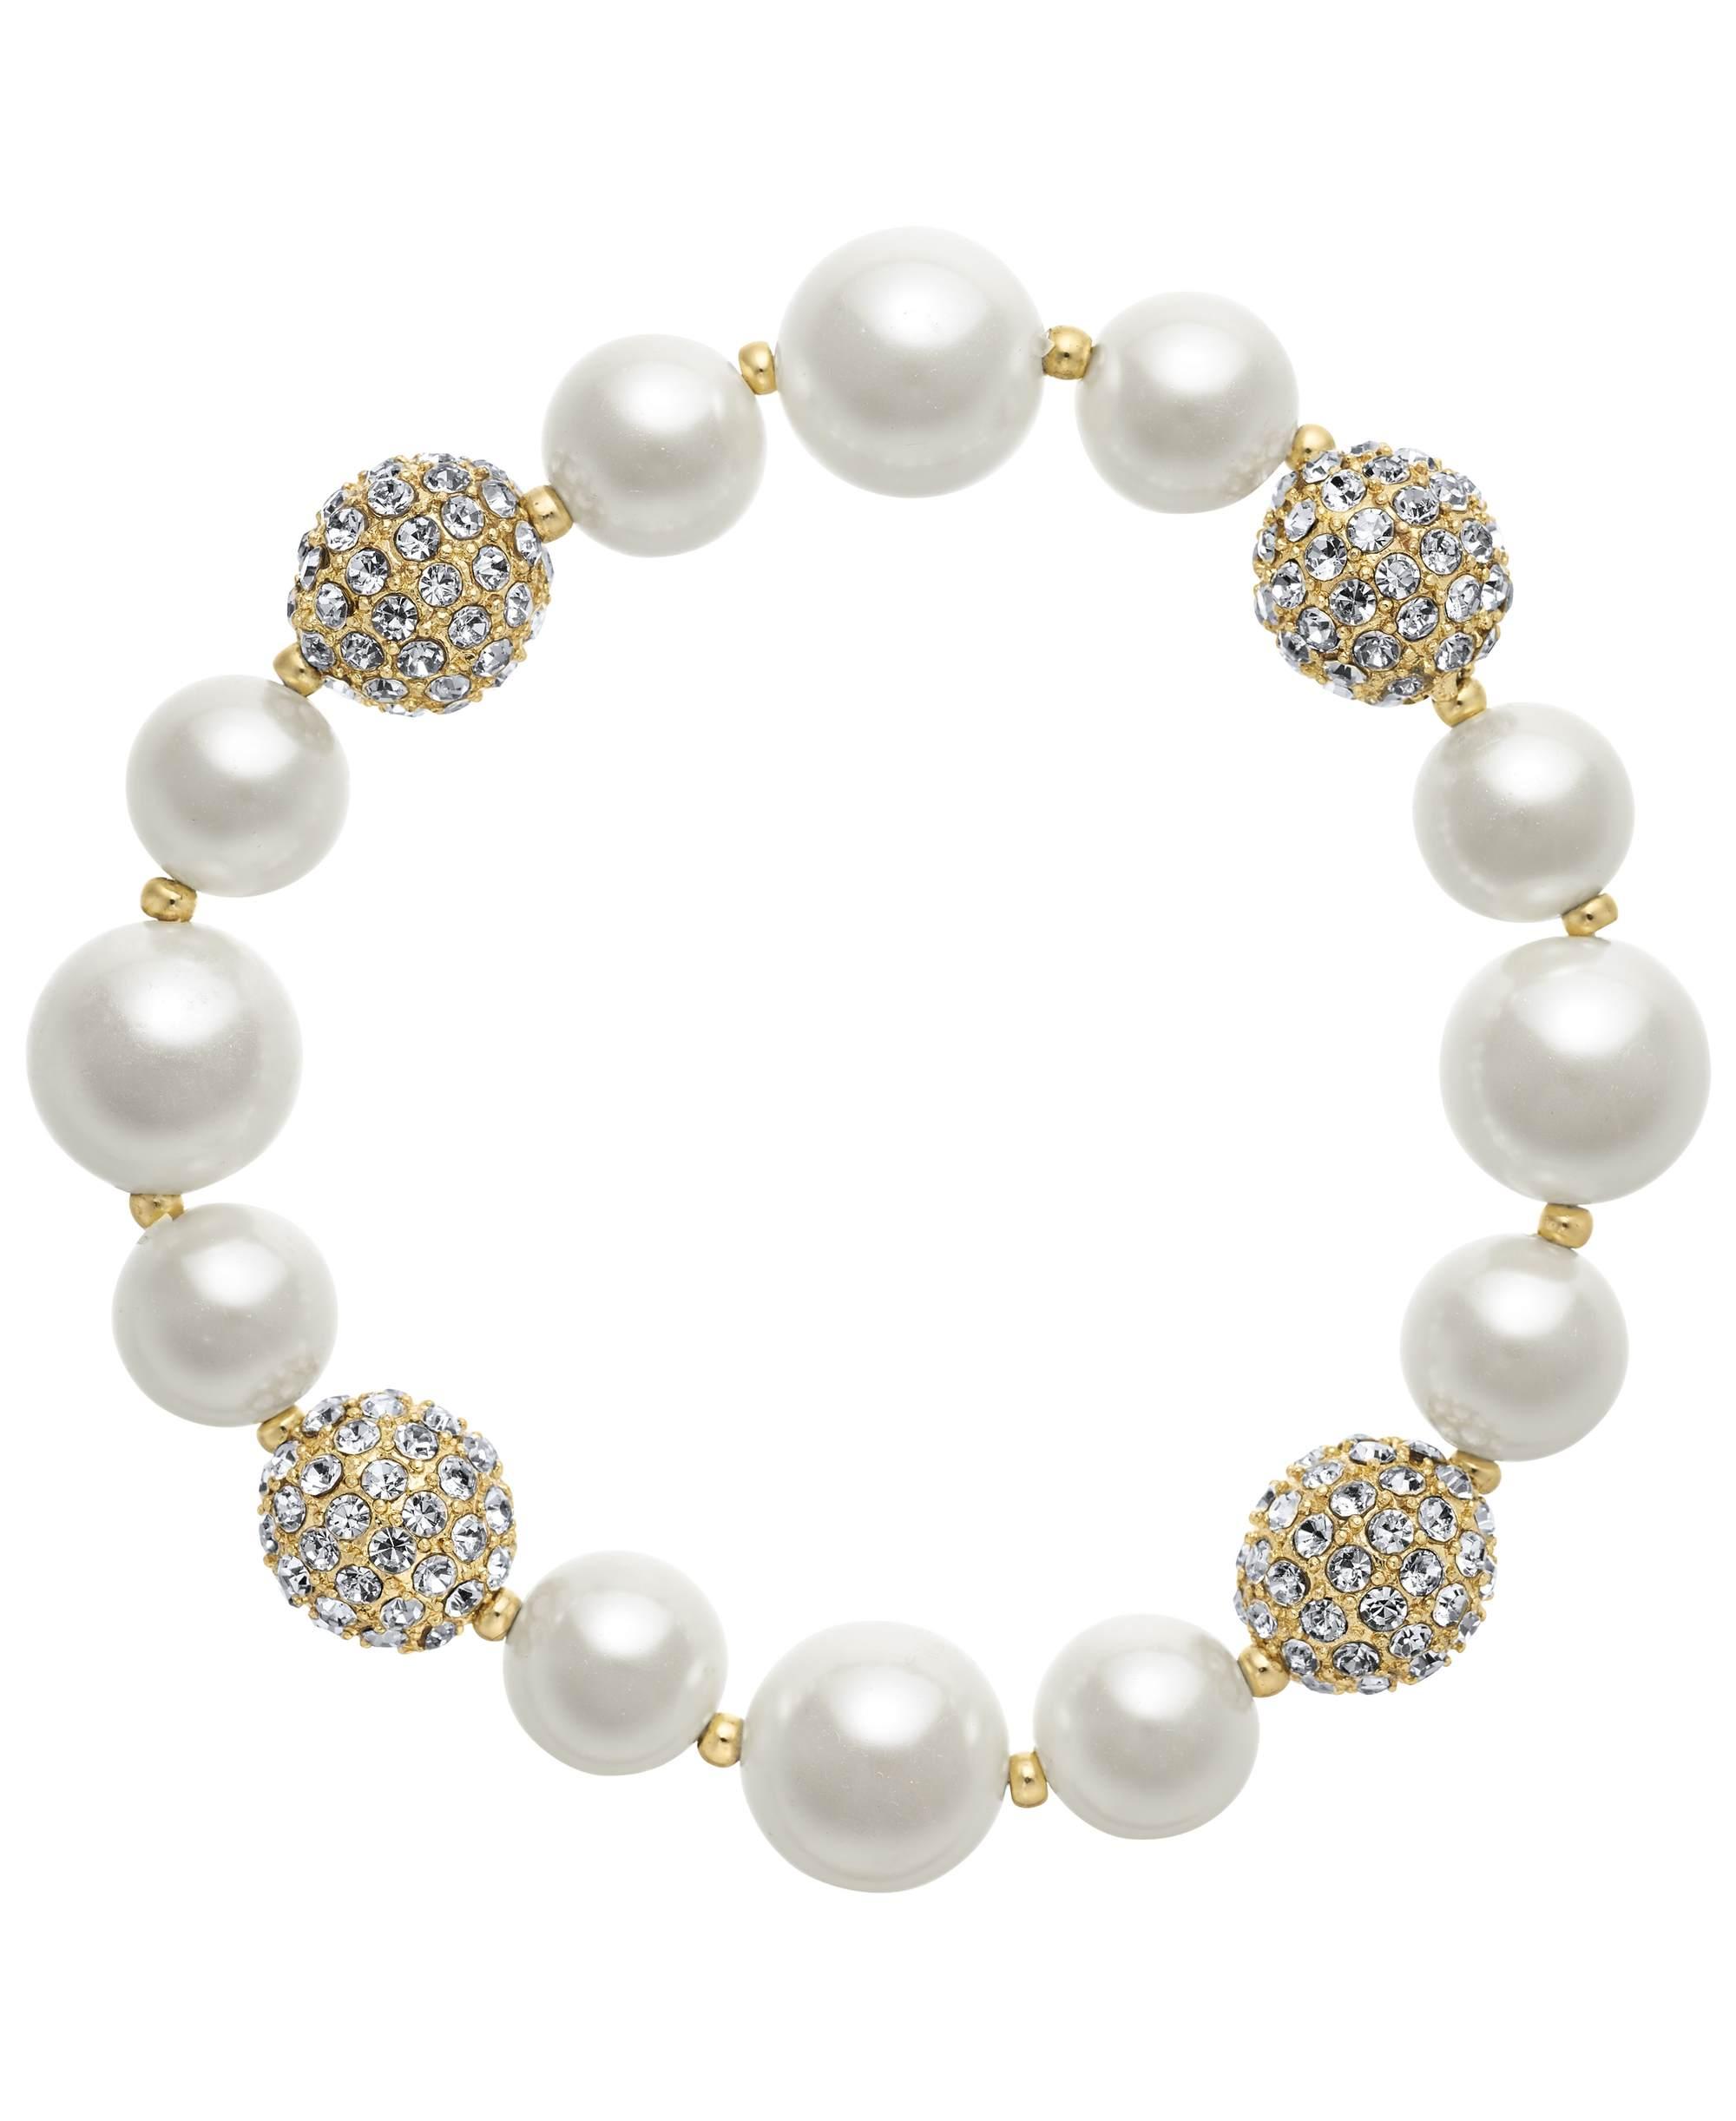 pearls_productphotgraphy_jewelry.jpg